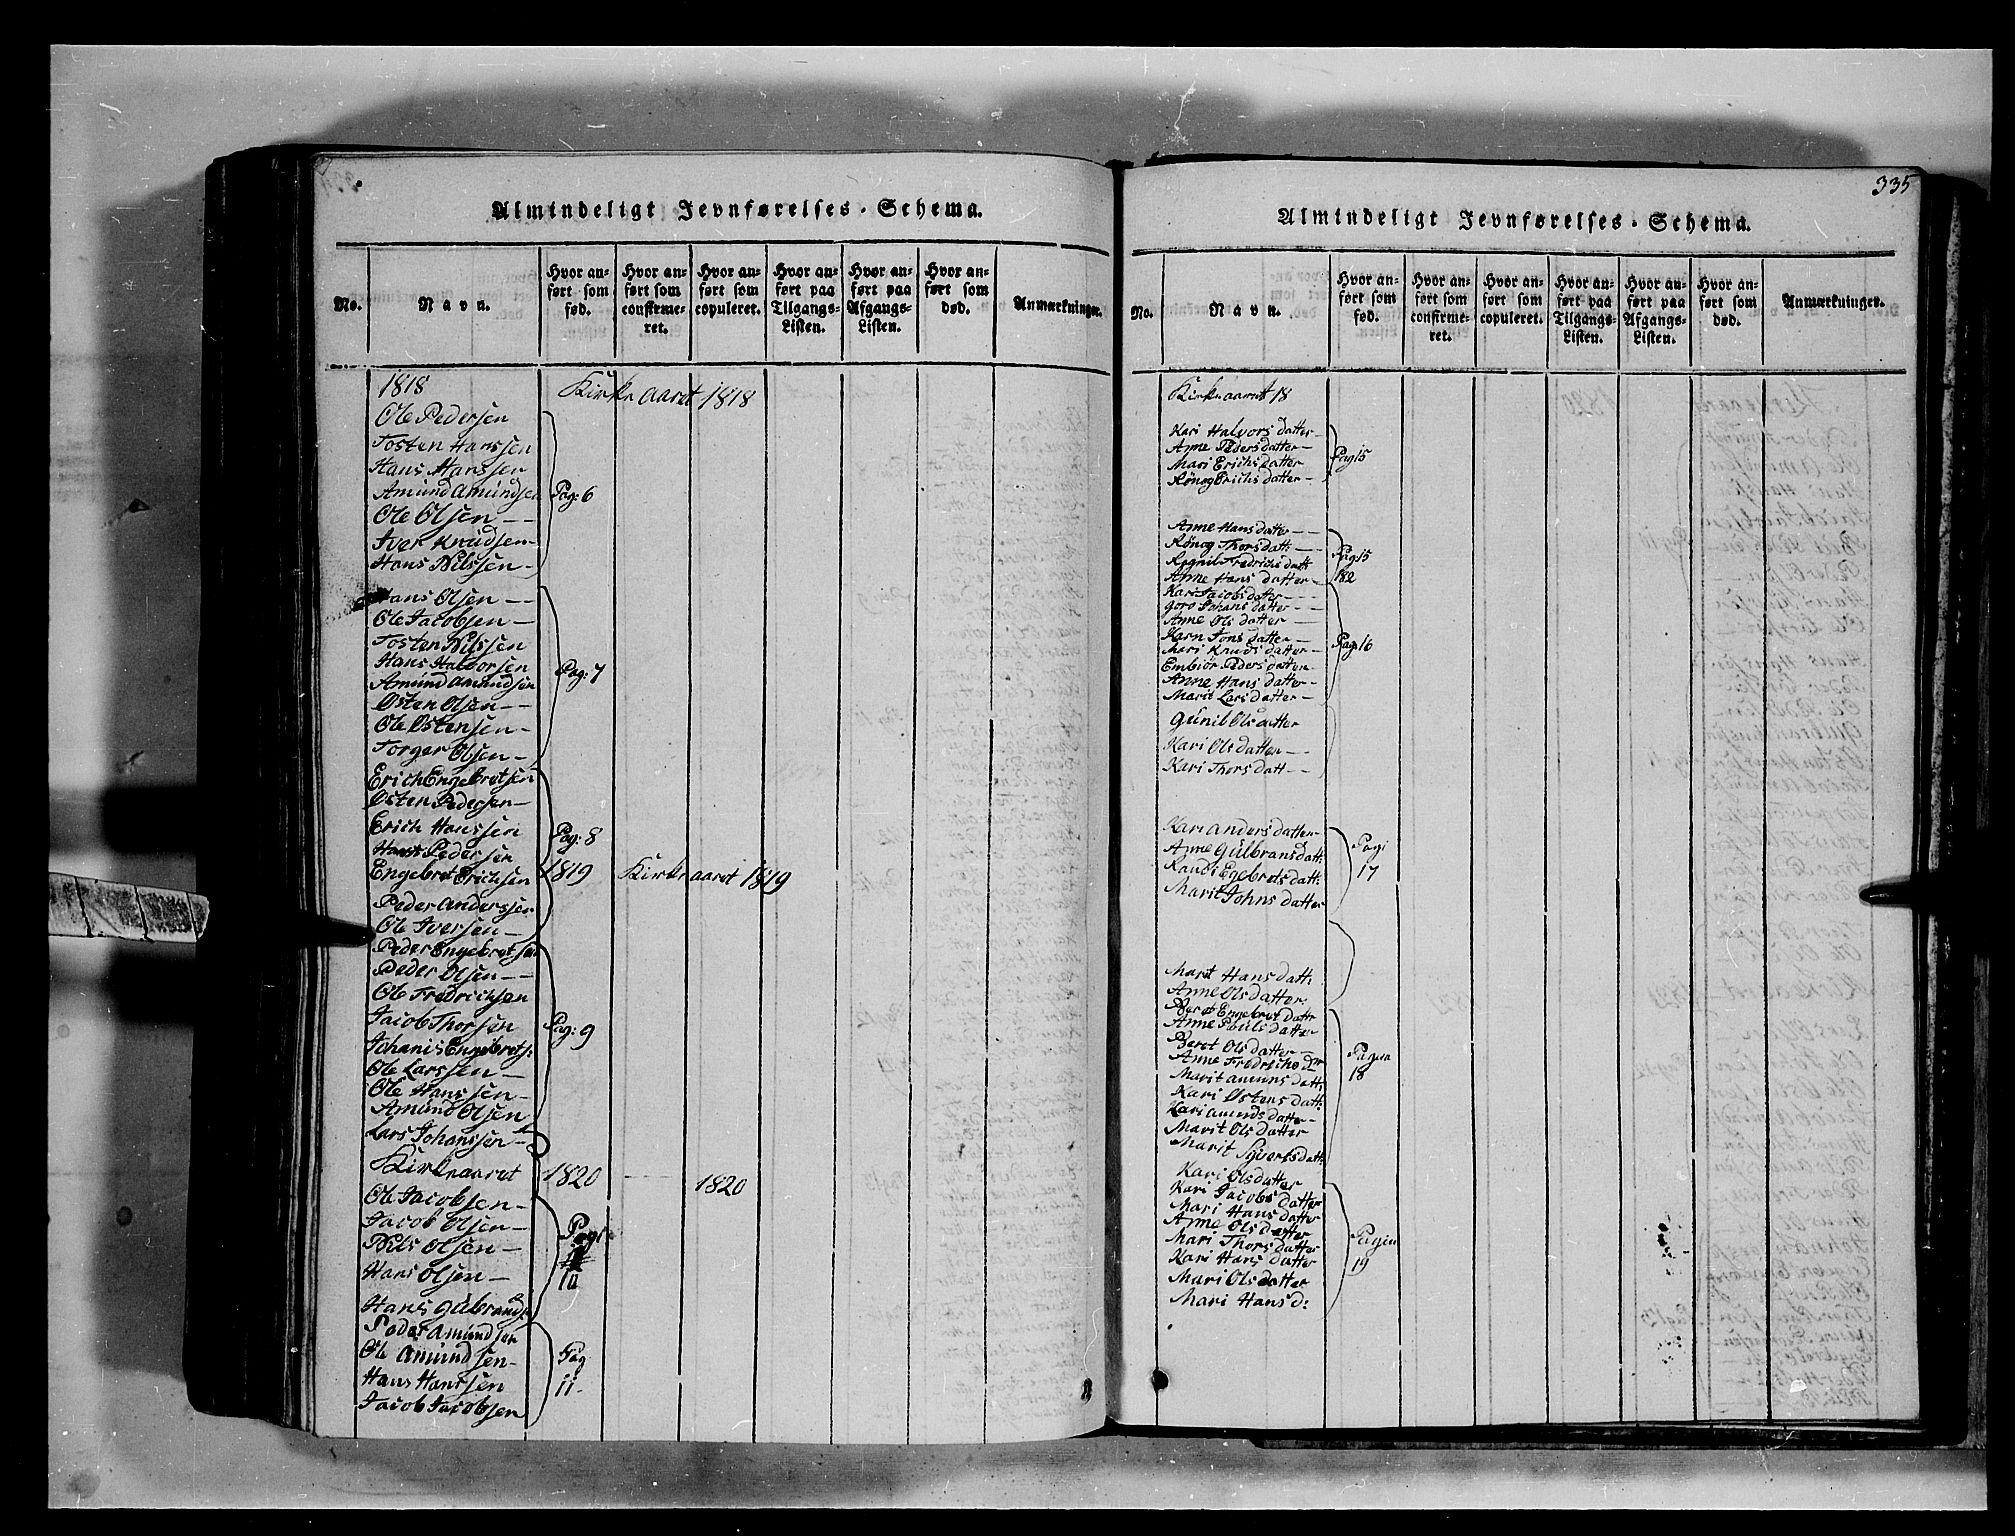 SAH, Fron prestekontor, H/Ha/Hab/L0002: Klokkerbok nr. 2, 1816-1850, s. 335